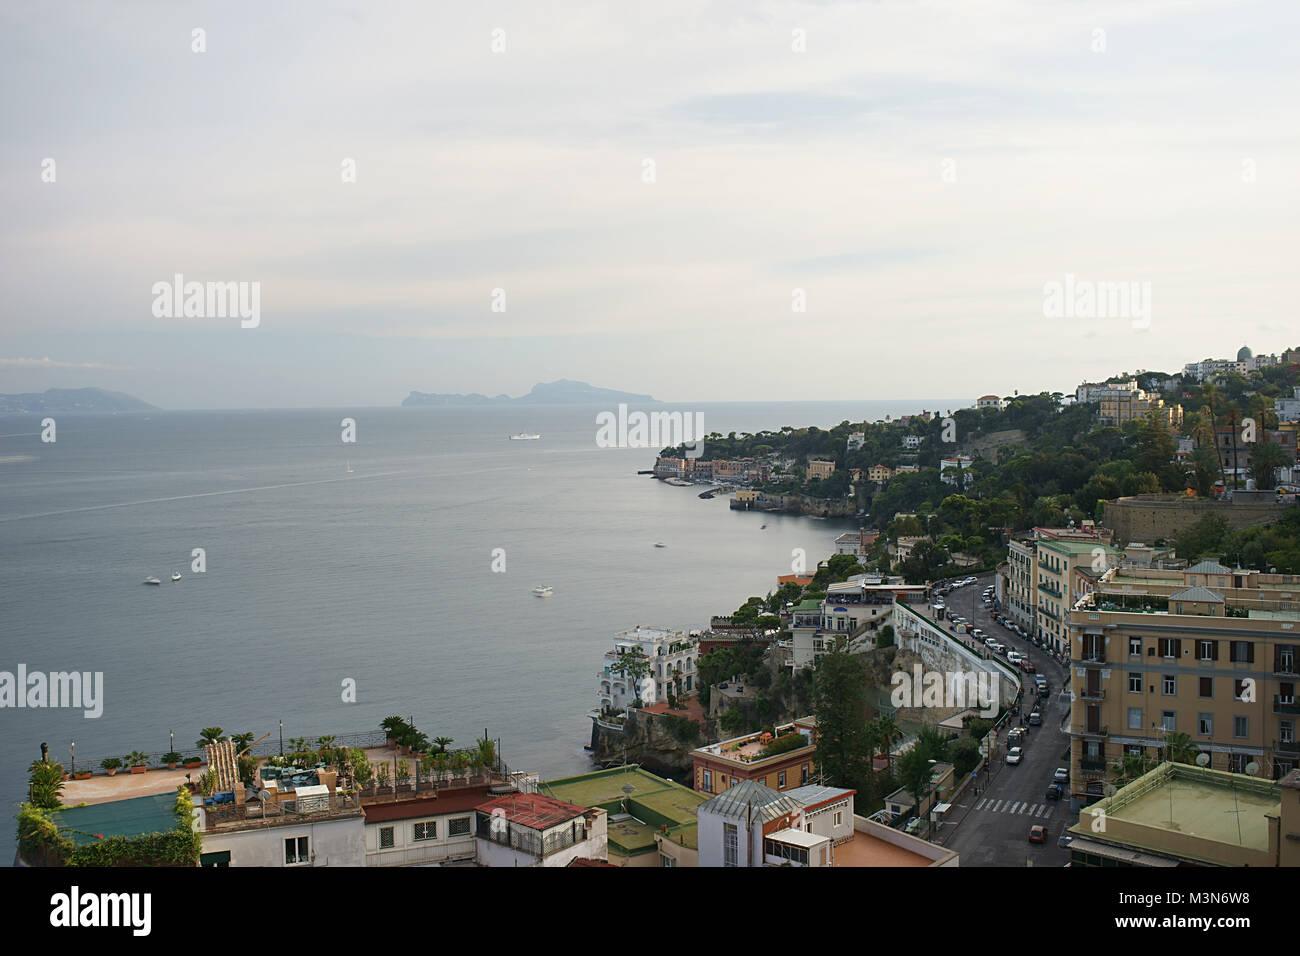 Posillipo Naples Napoli Immagini & Posillipo Naples Napoli Fotos ...